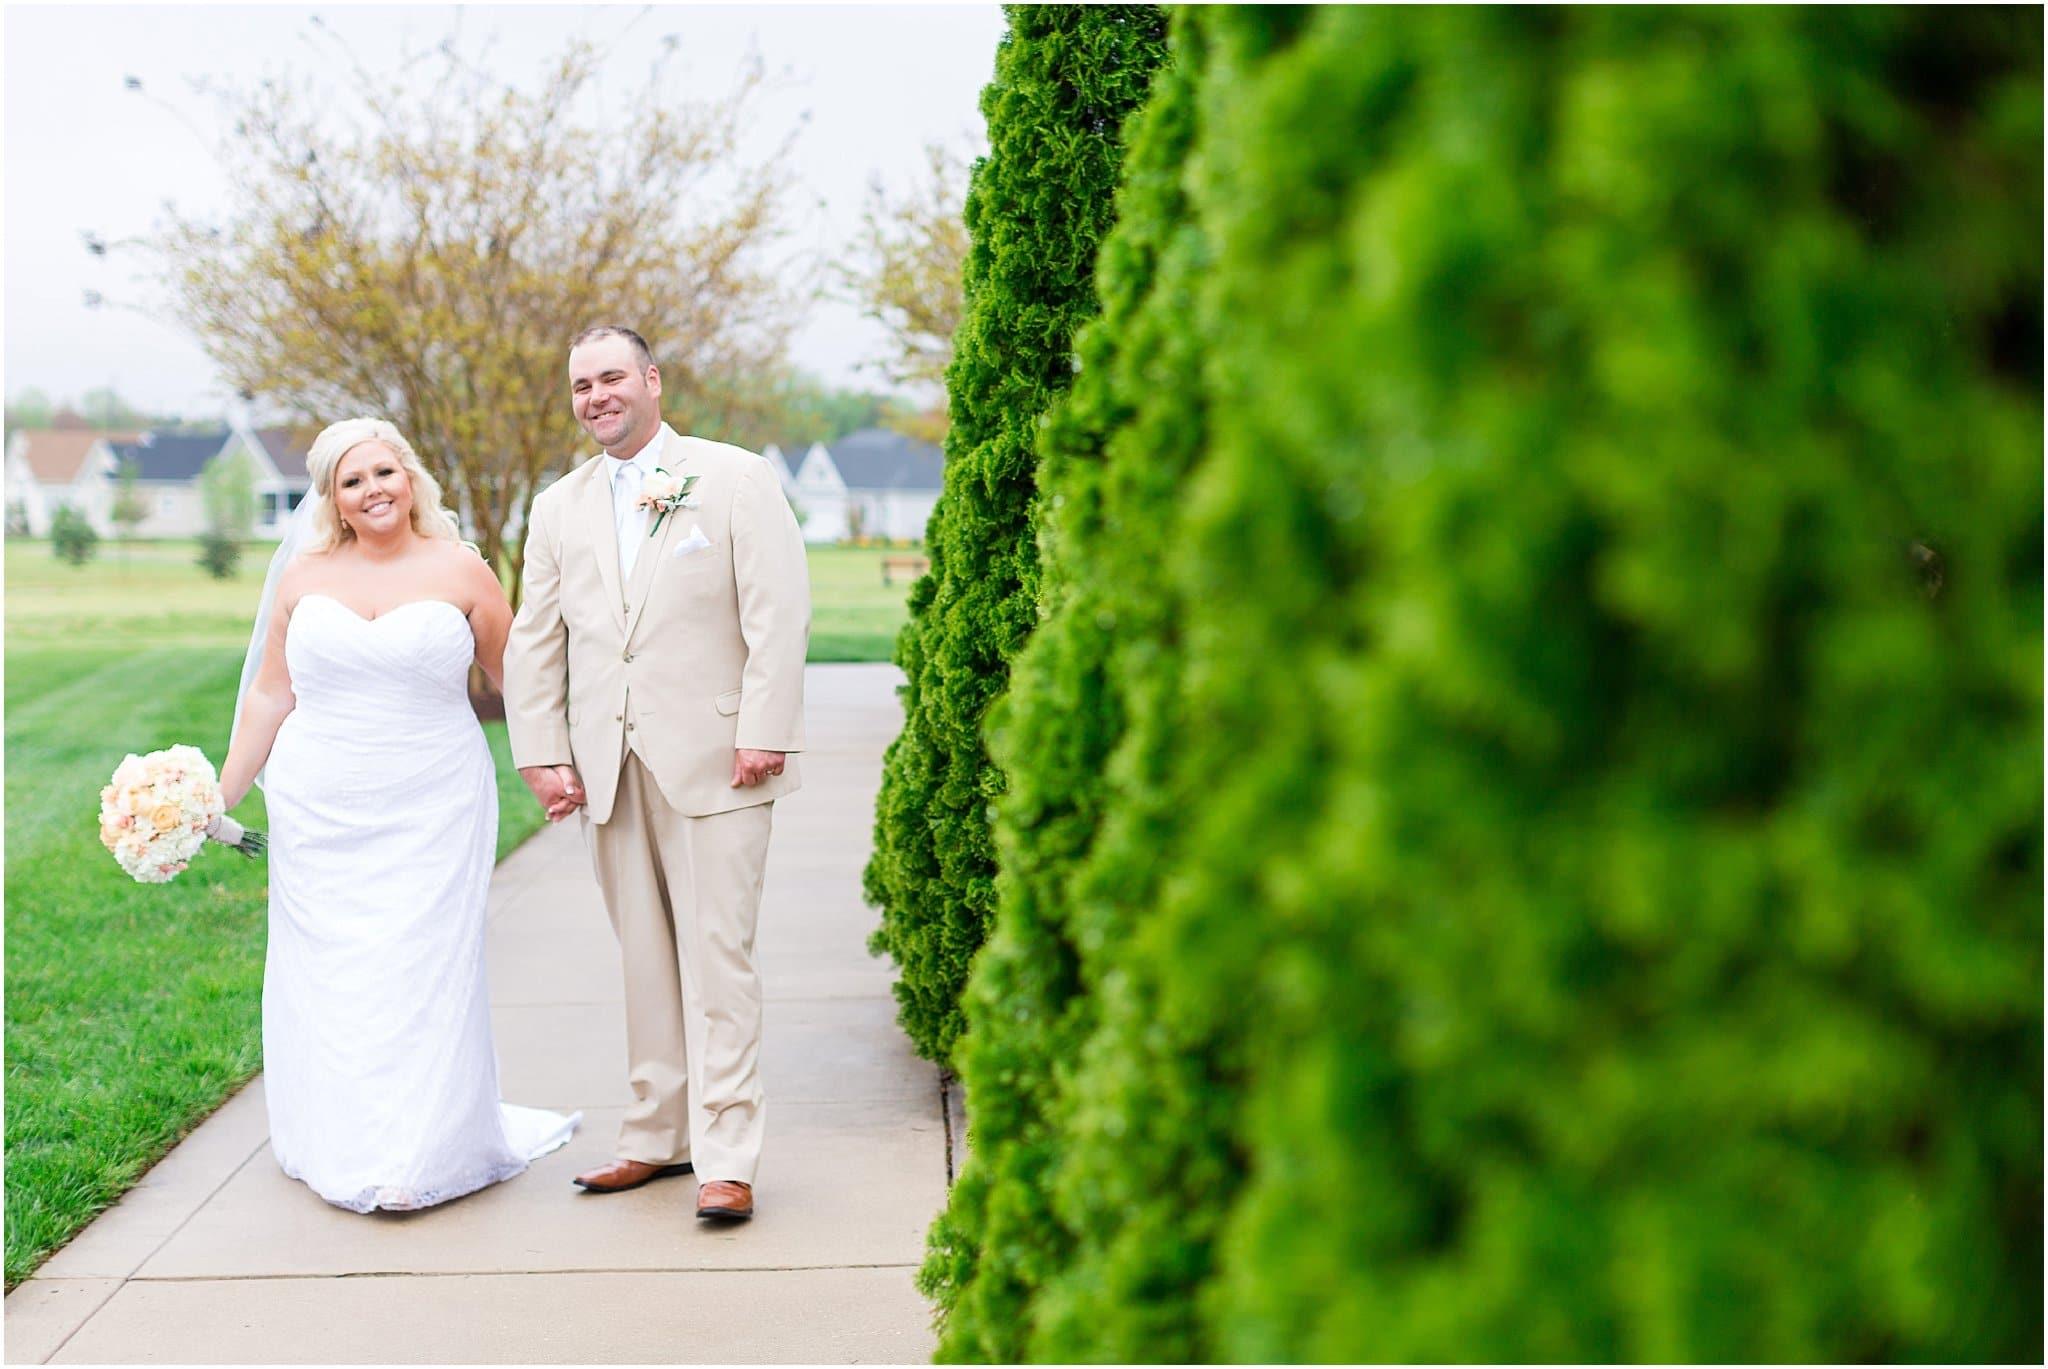 jessscott-milsboro-delaware-wedding-cassidymrphotography_0052